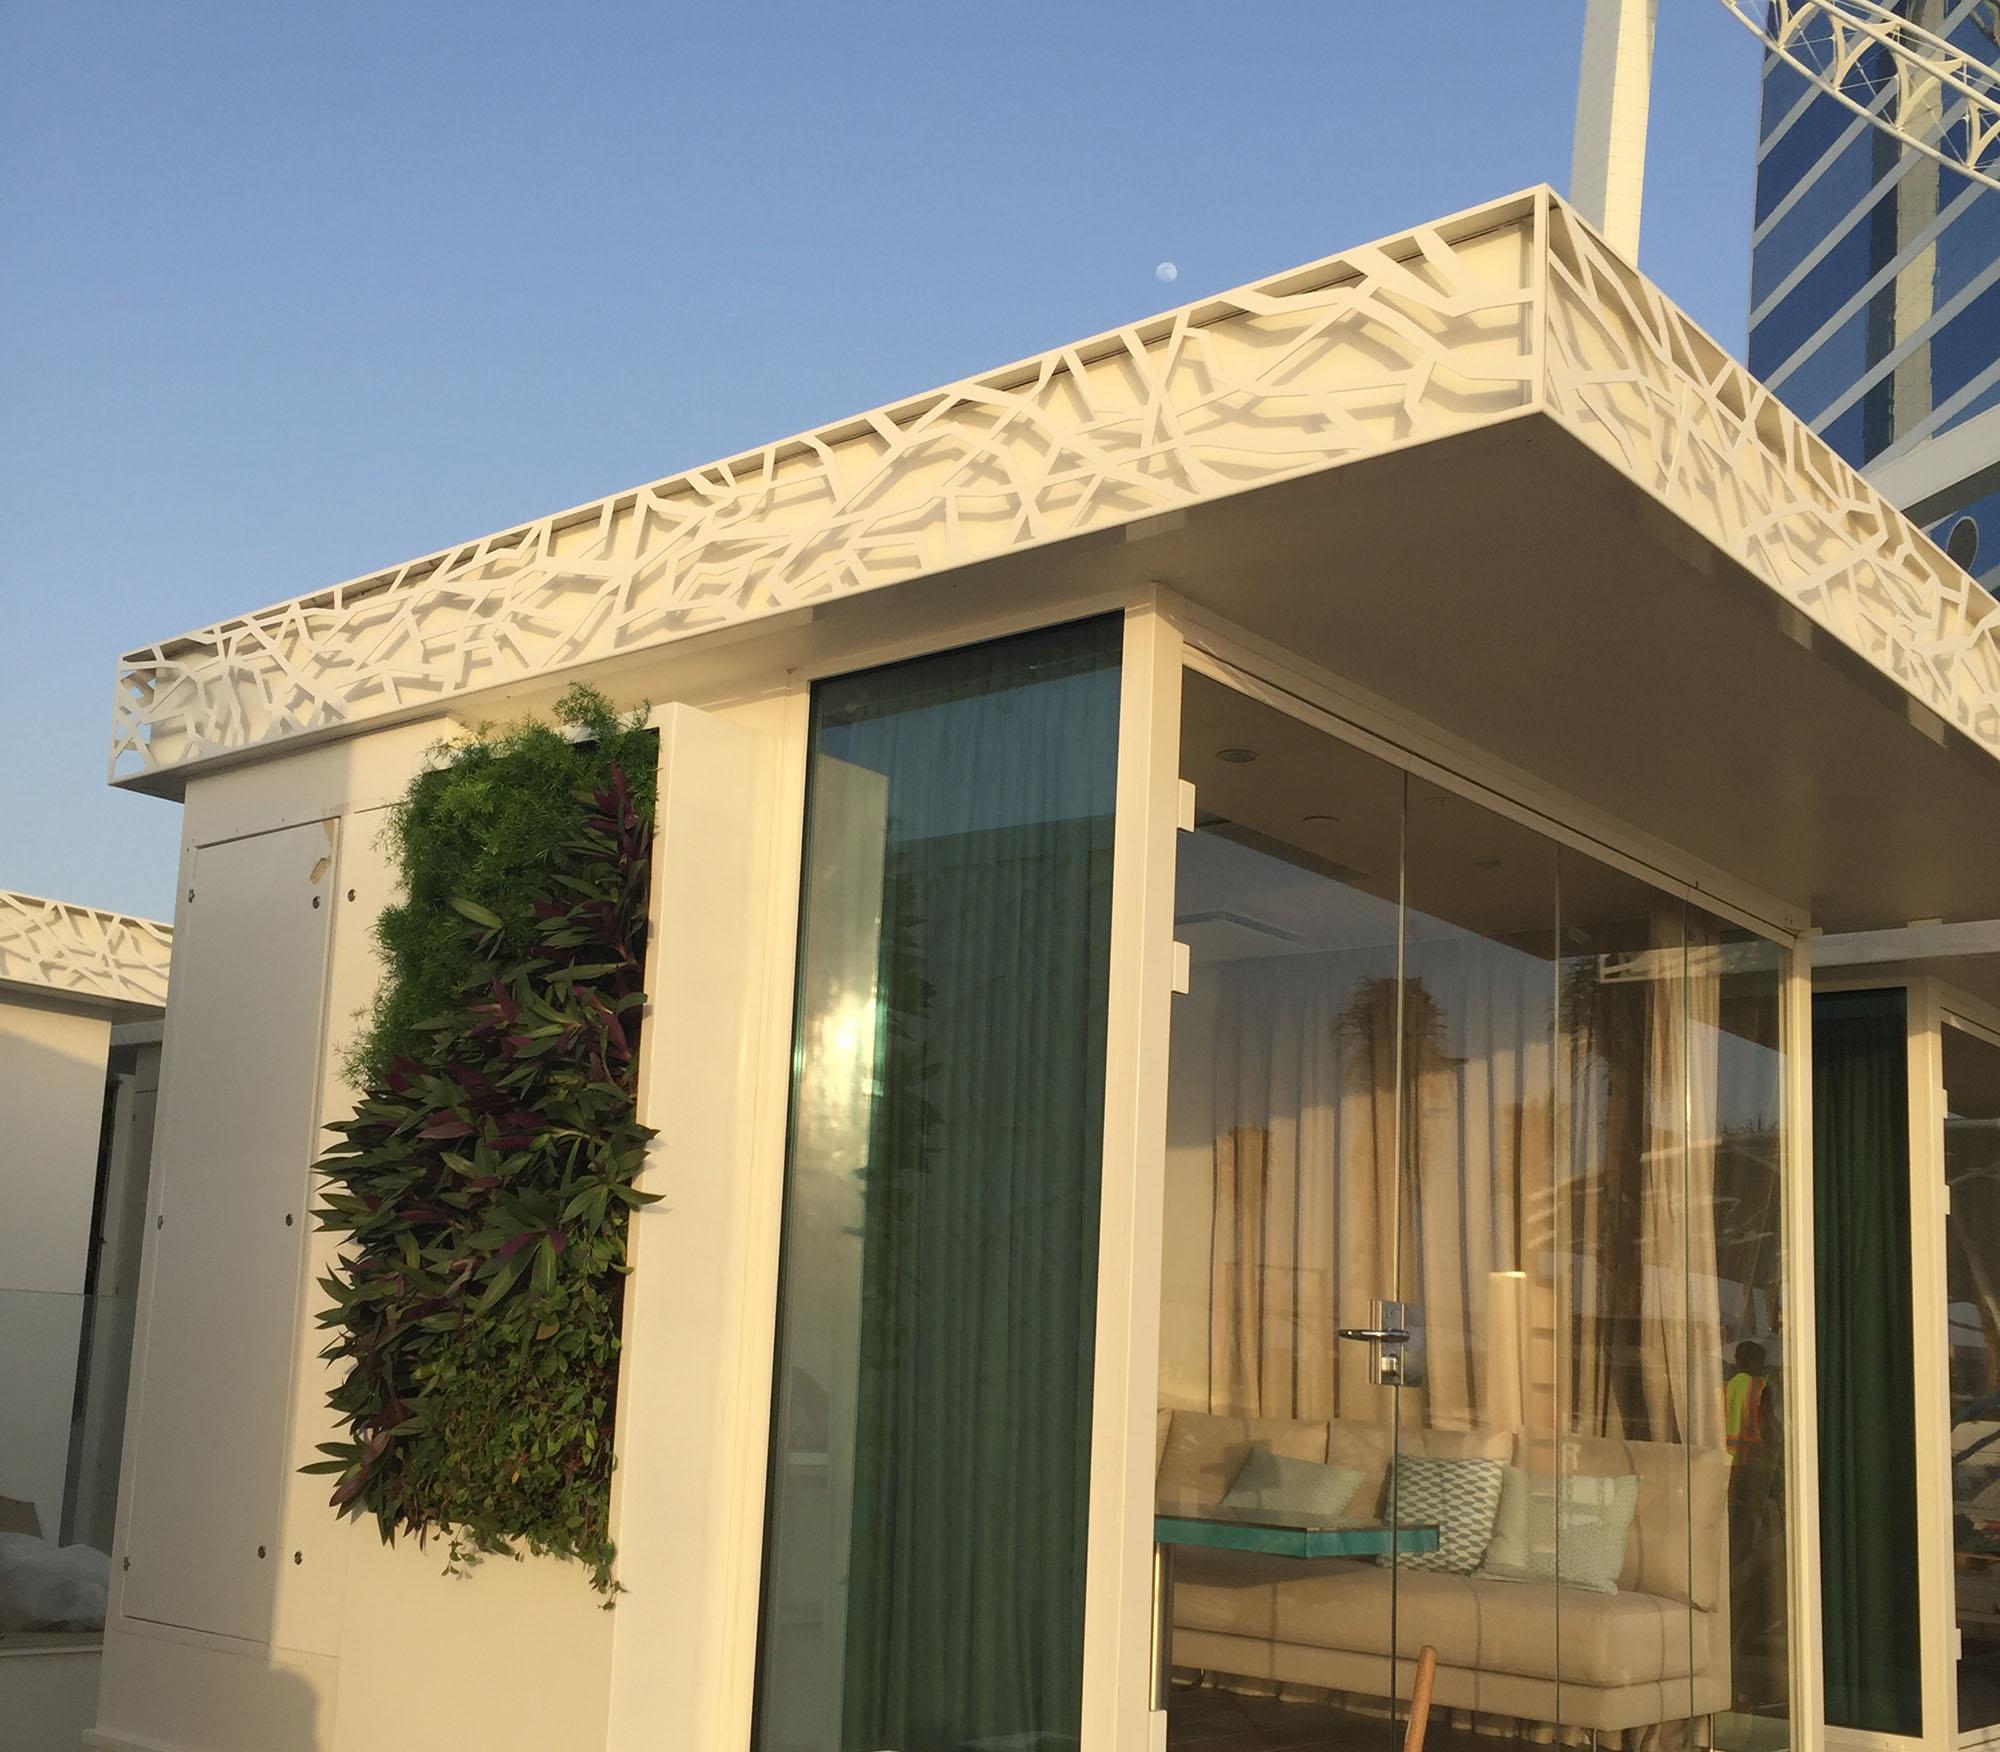 Burj-al-arab-header.jpg